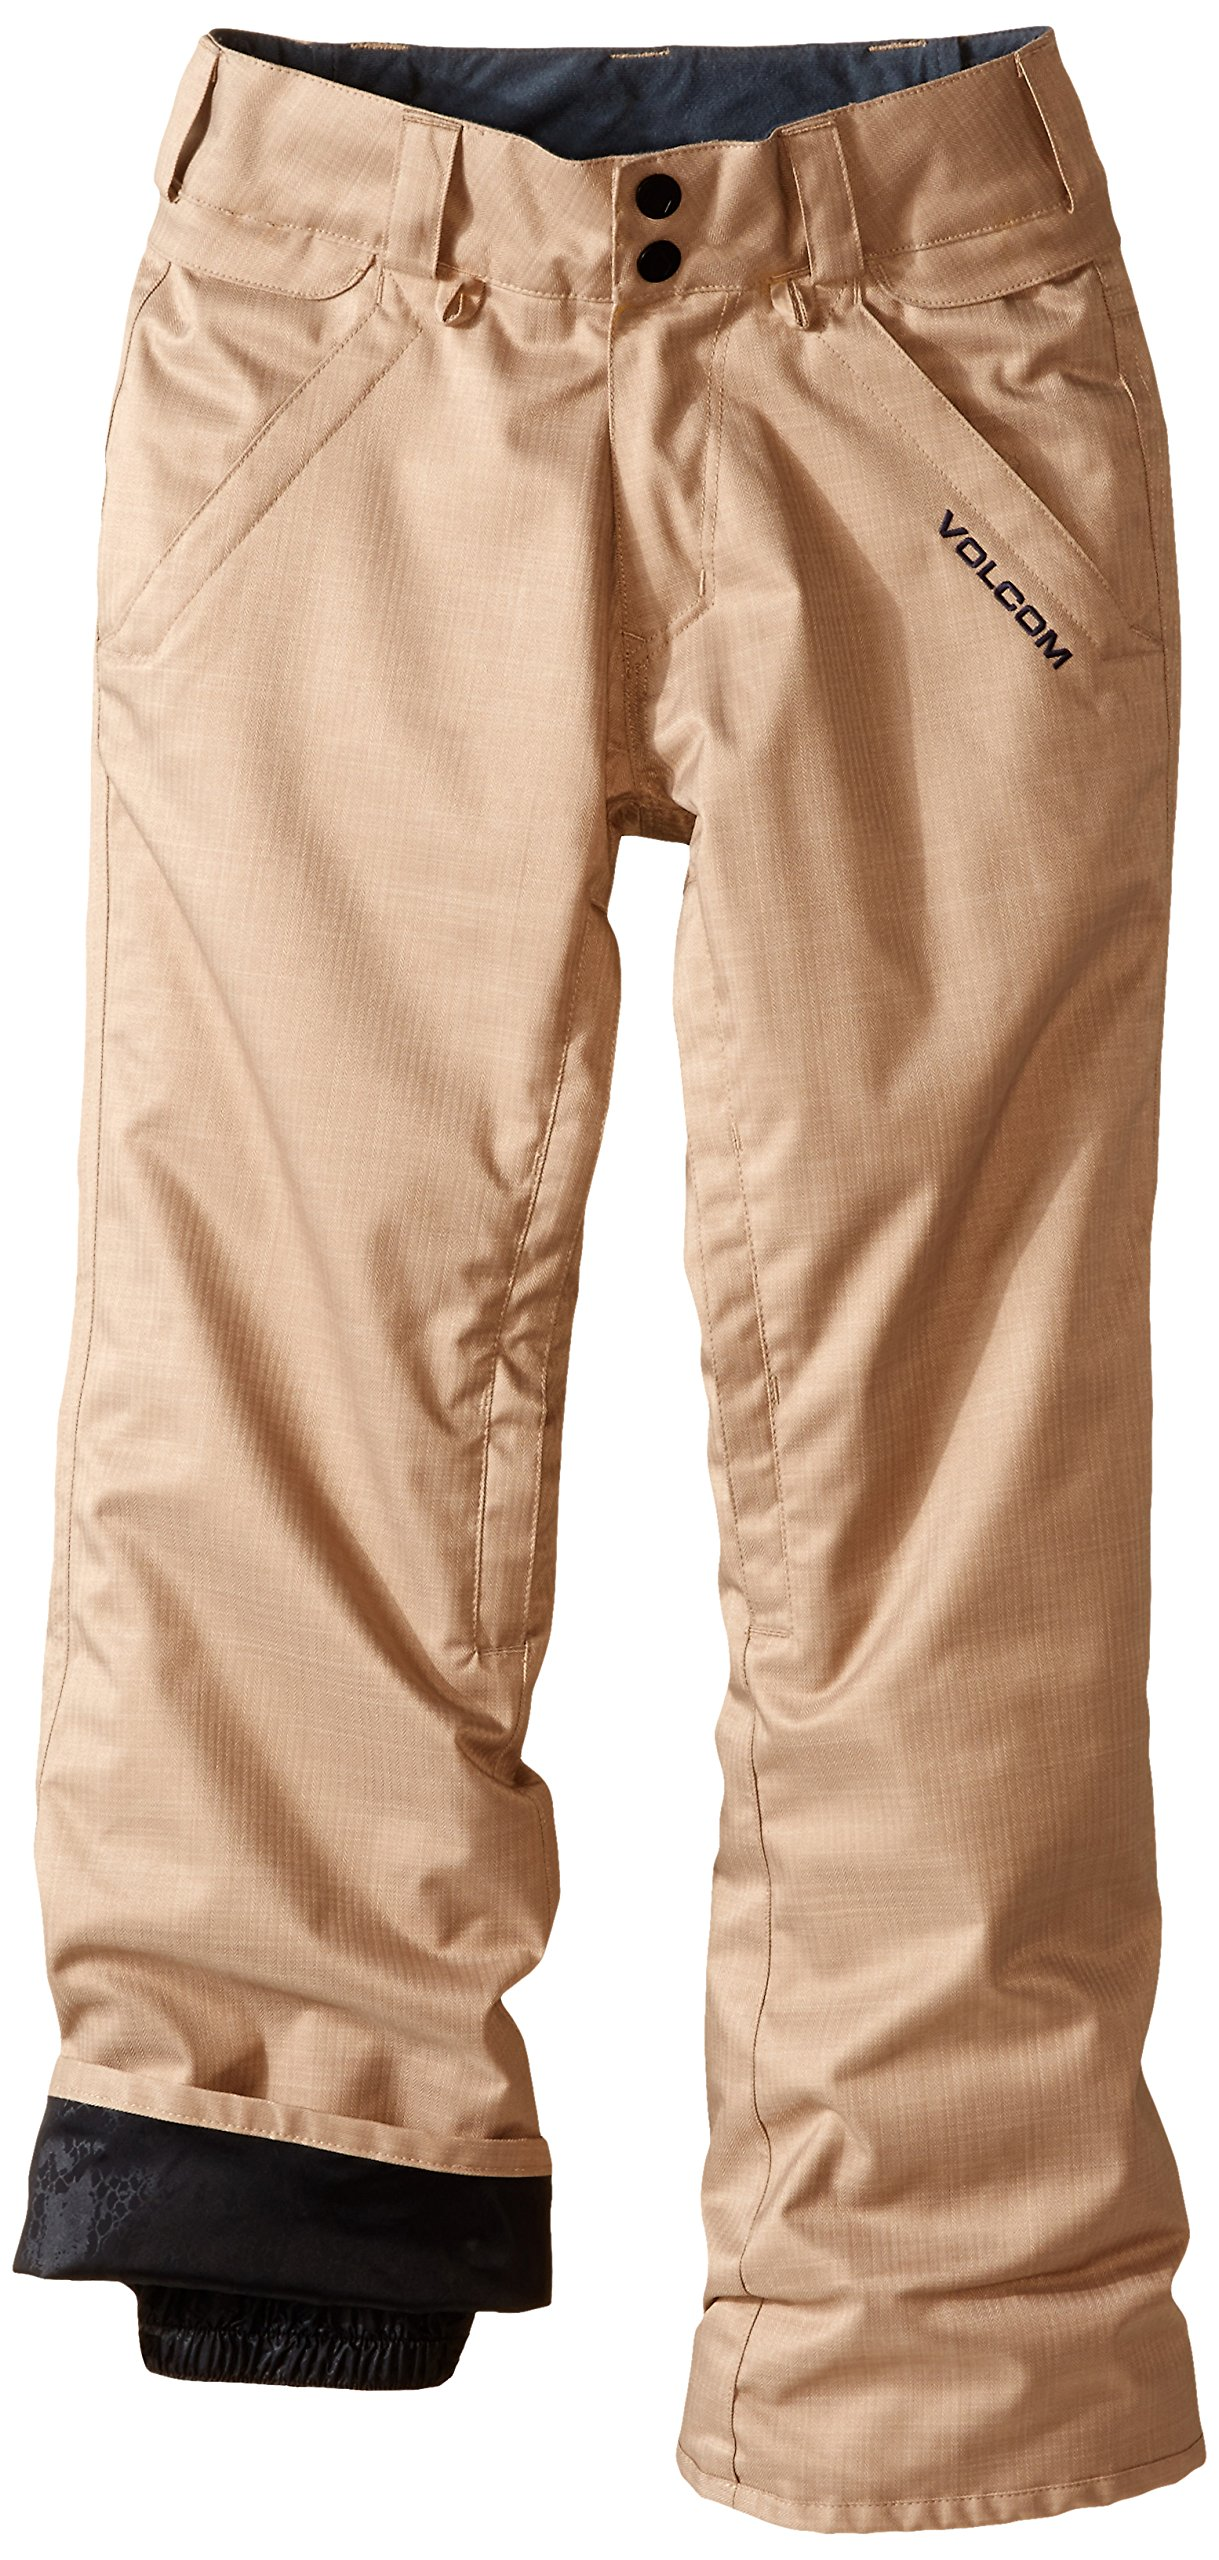 Volcom Big Boys' Frickin Insulated Chino Pant, Khaki, X-Small